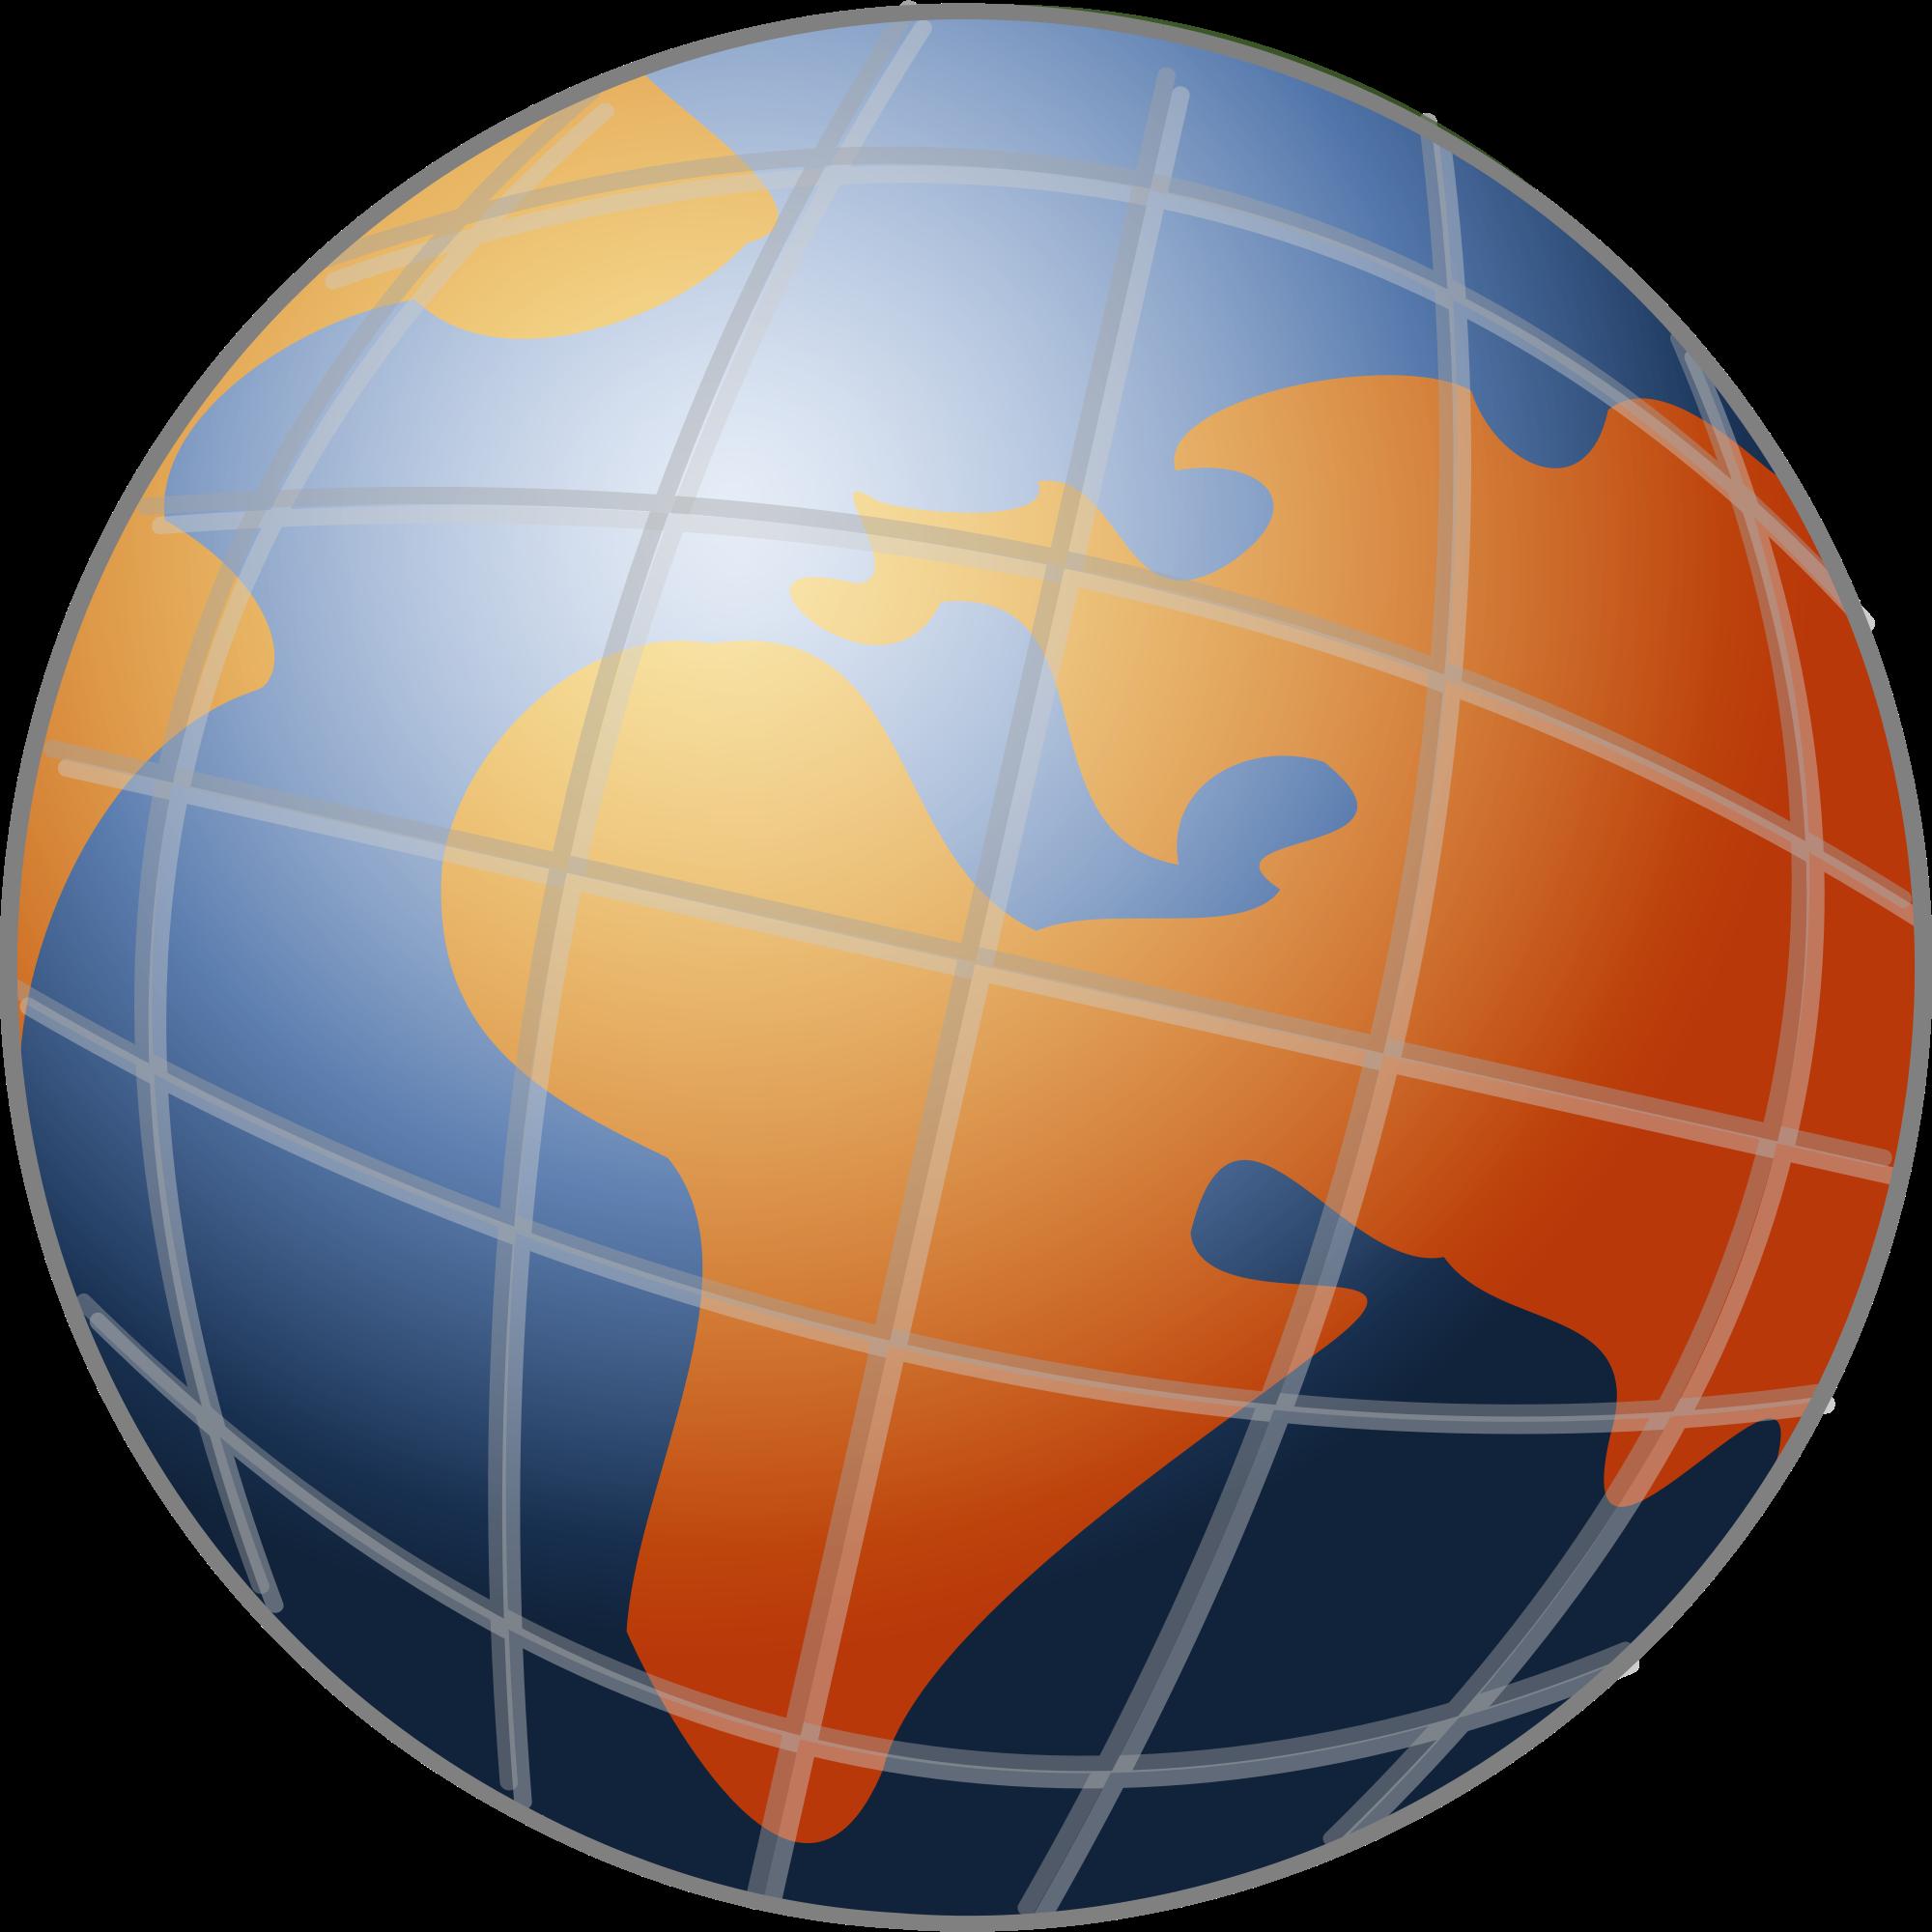 Clipart earth clip art. File svg wikimedia commons